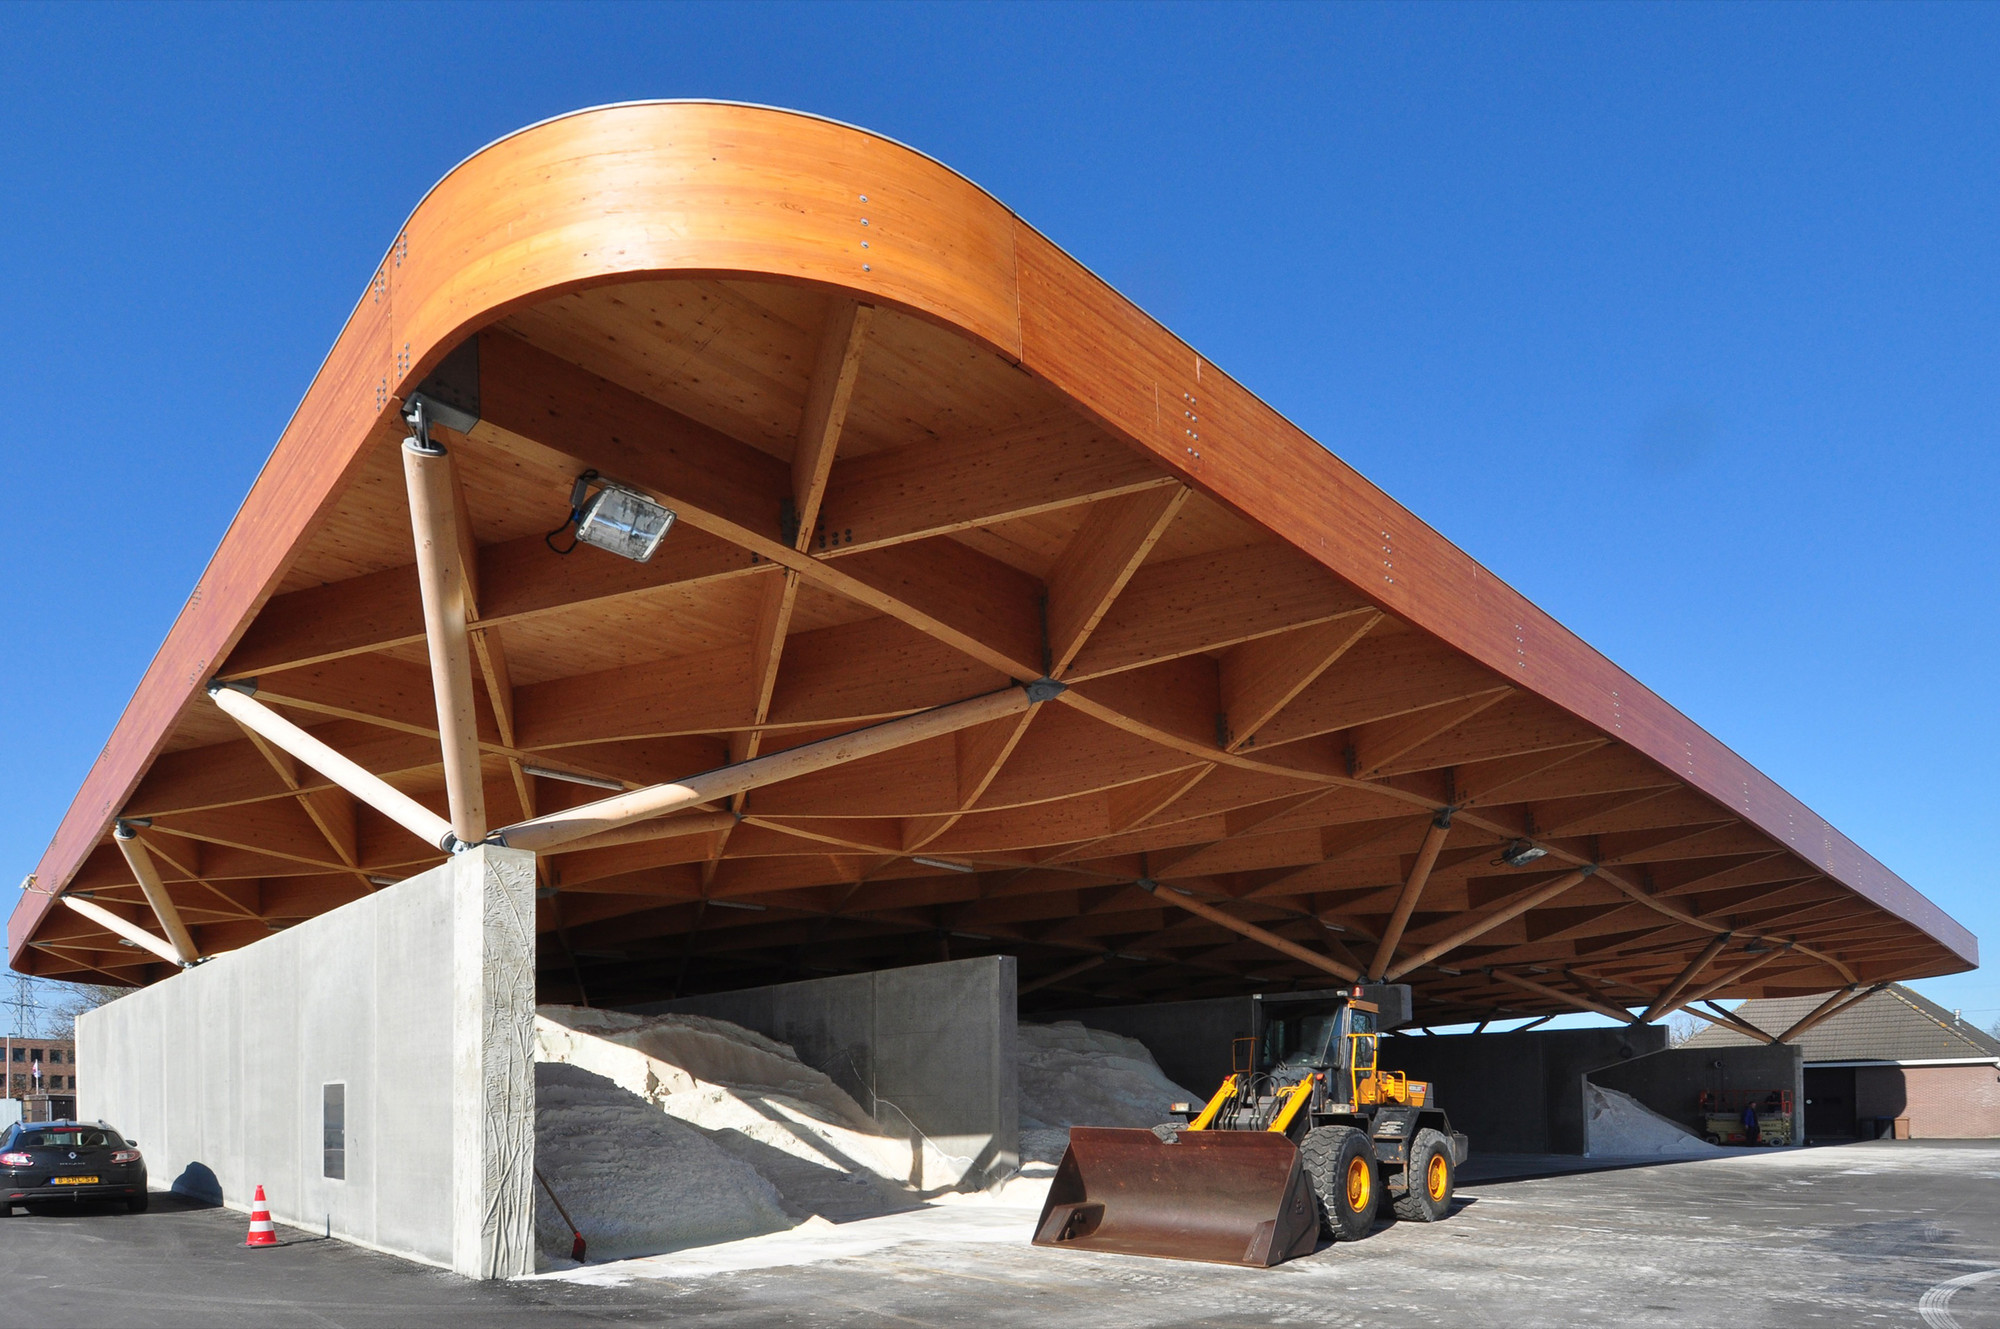 Highway Support Center / 24H architecture, Courtesy of Boris Zeisser